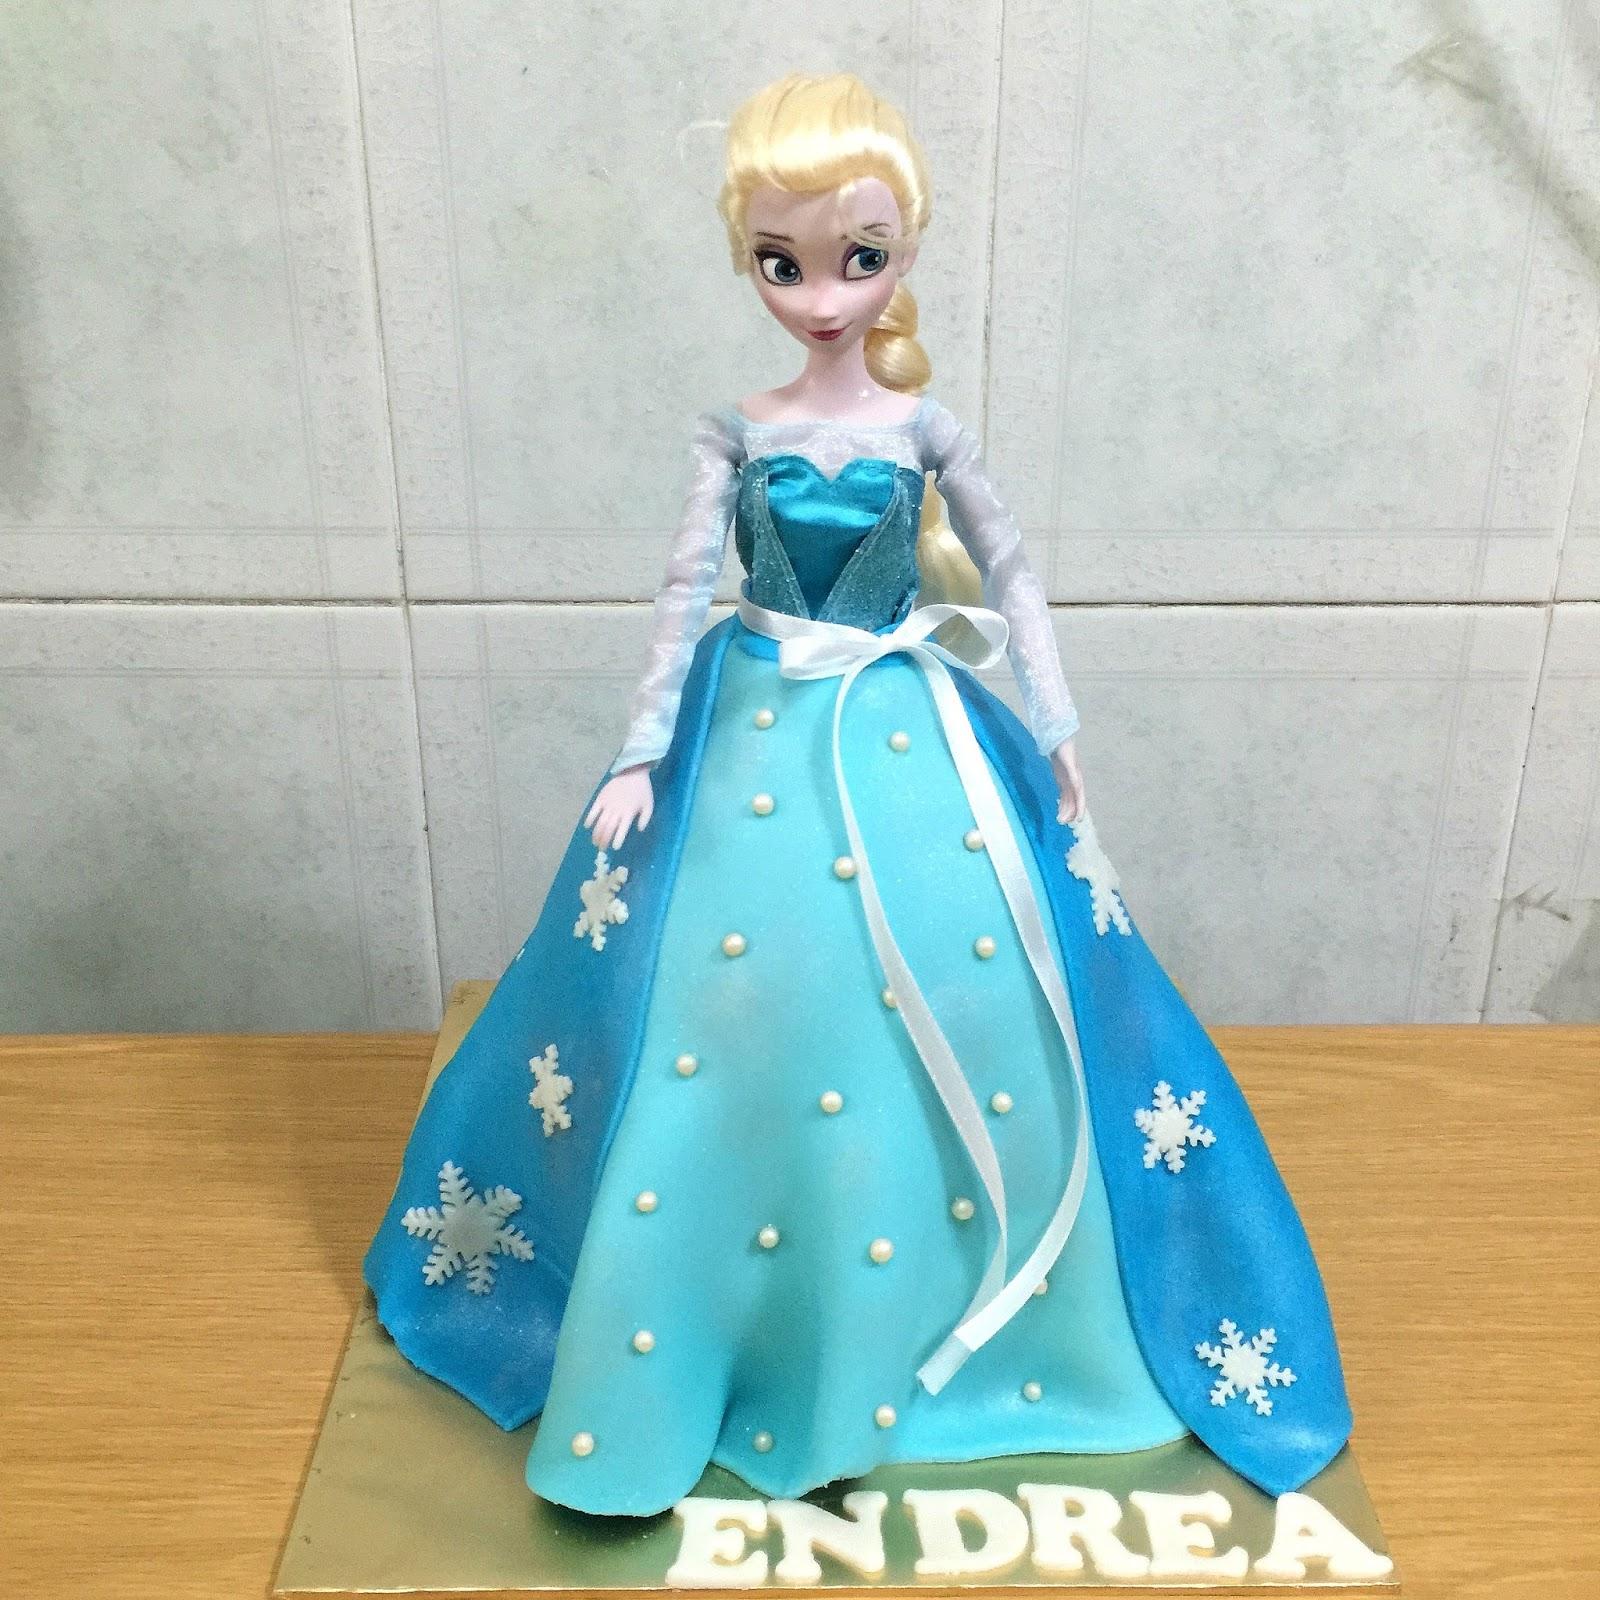 How To Make An Elsa Dress Cake